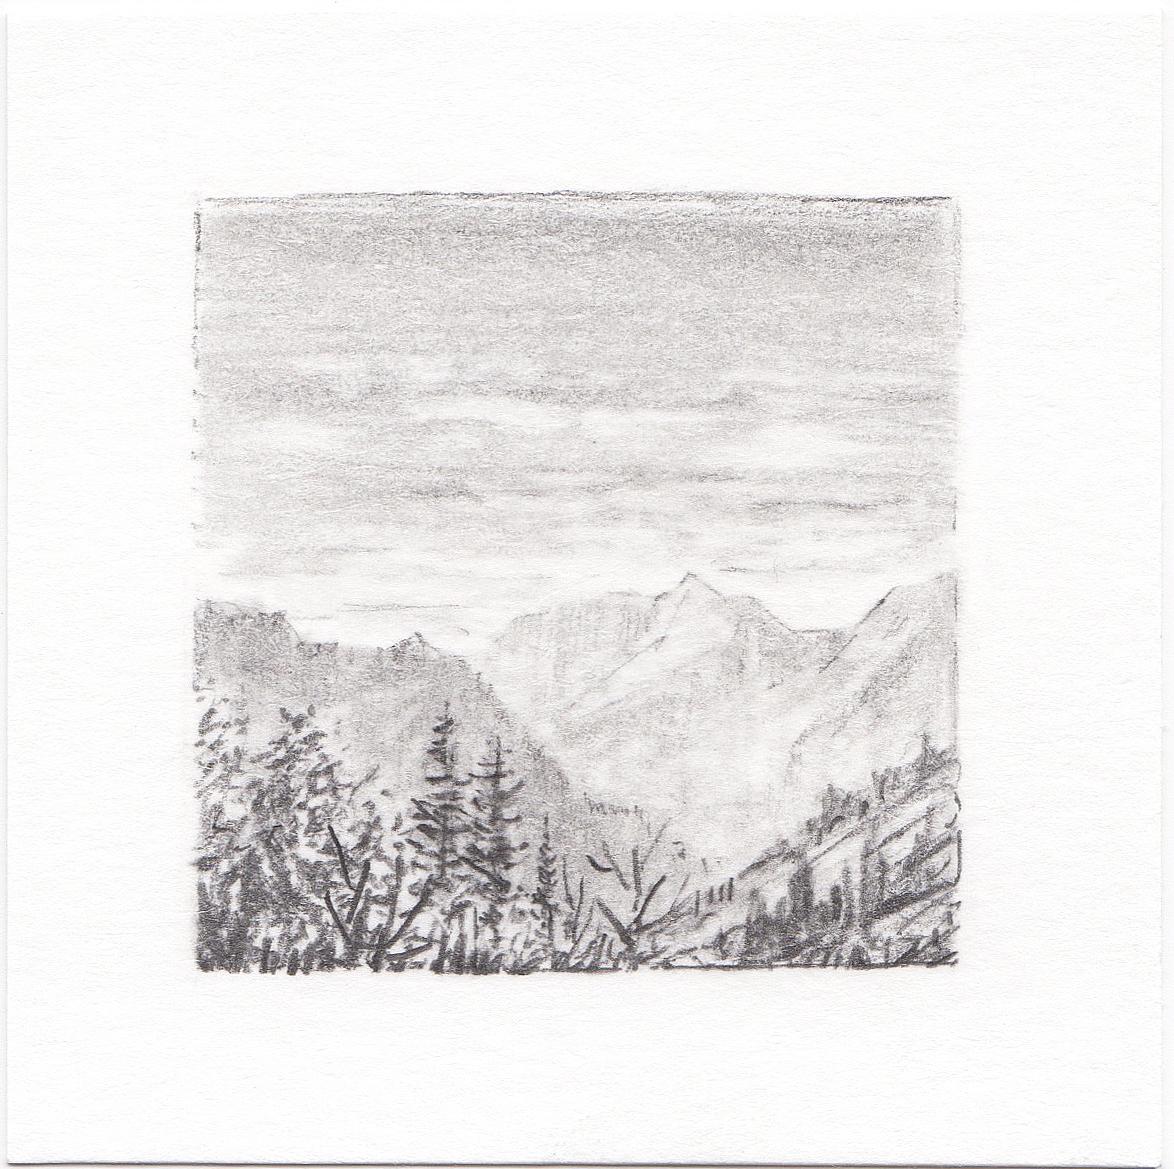 #41 Yosemite National Park, California | 3x3 | graphite